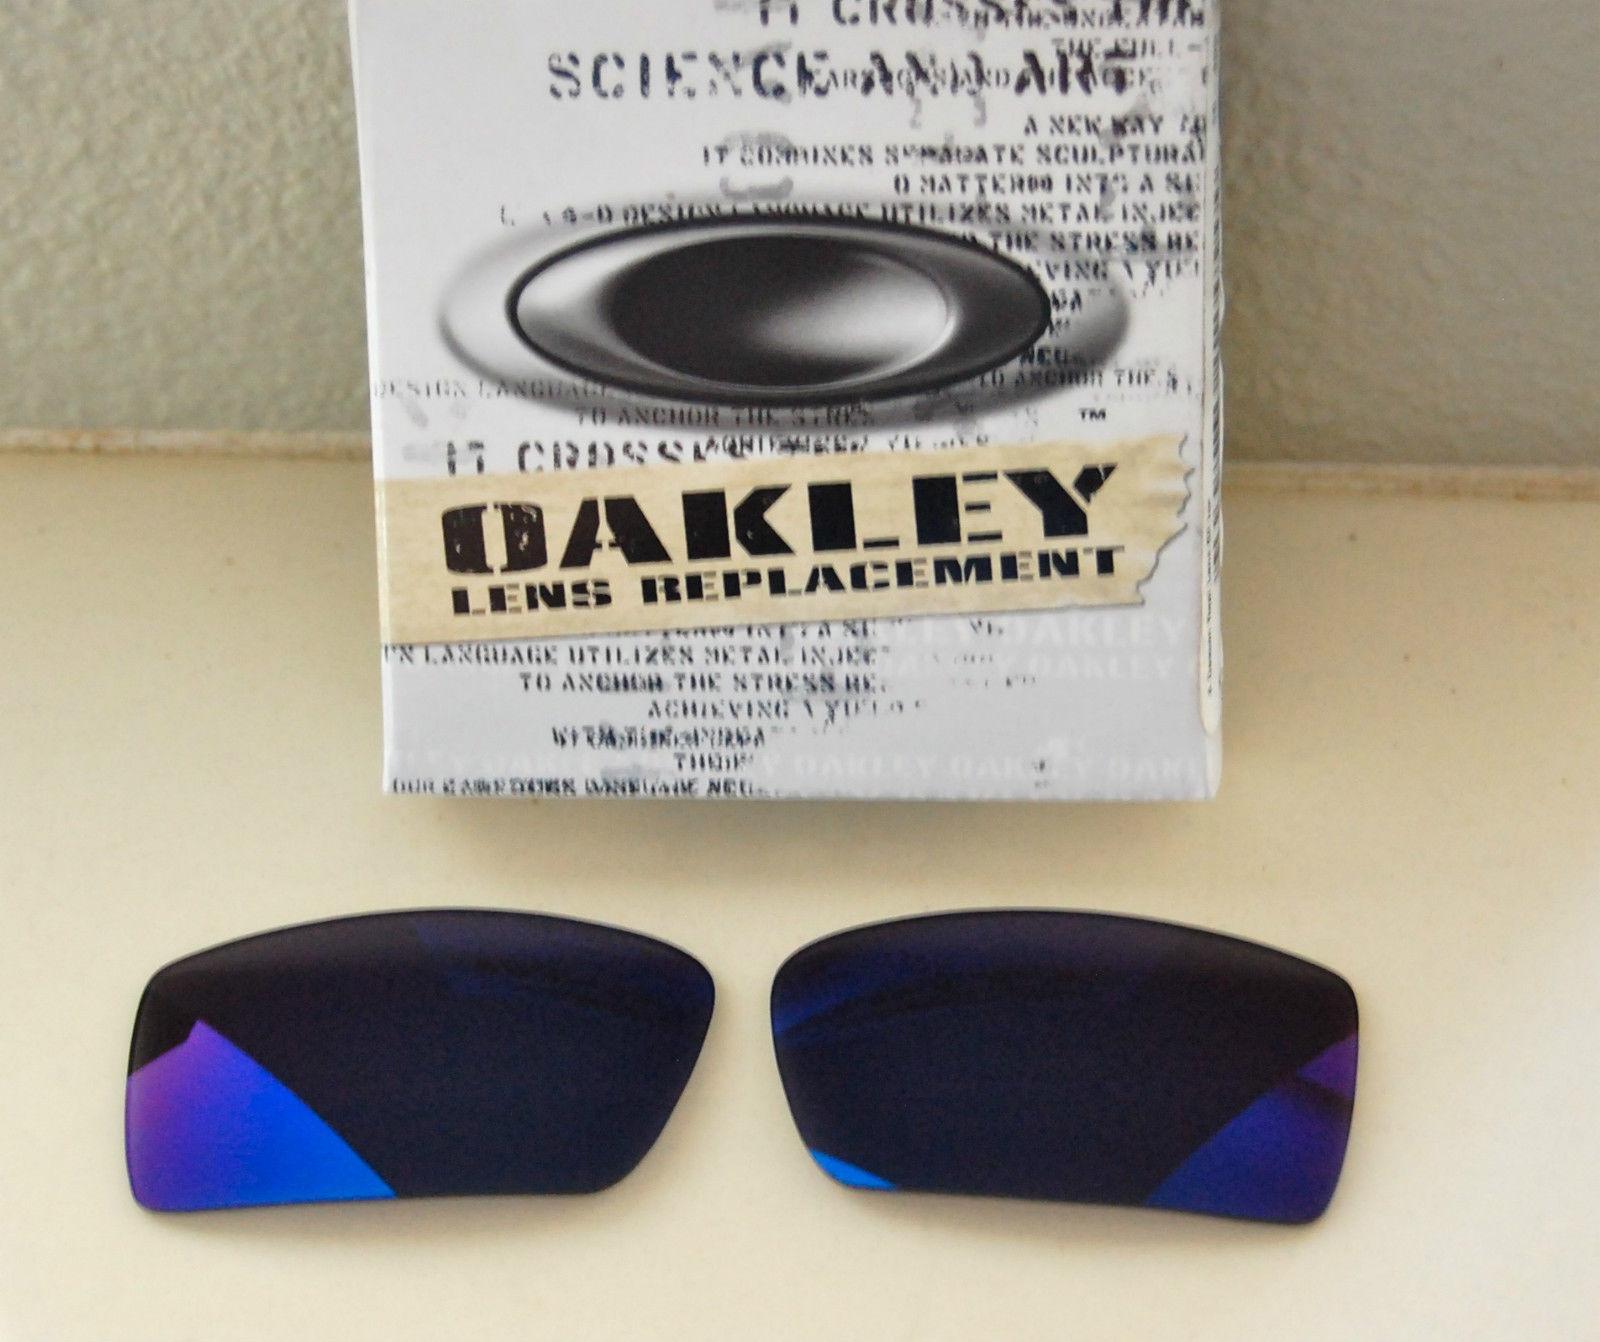 replacement lenses for oakley gascan dcf7  Lensa Oakley Gascan Asian 100% Original Replacement Lense